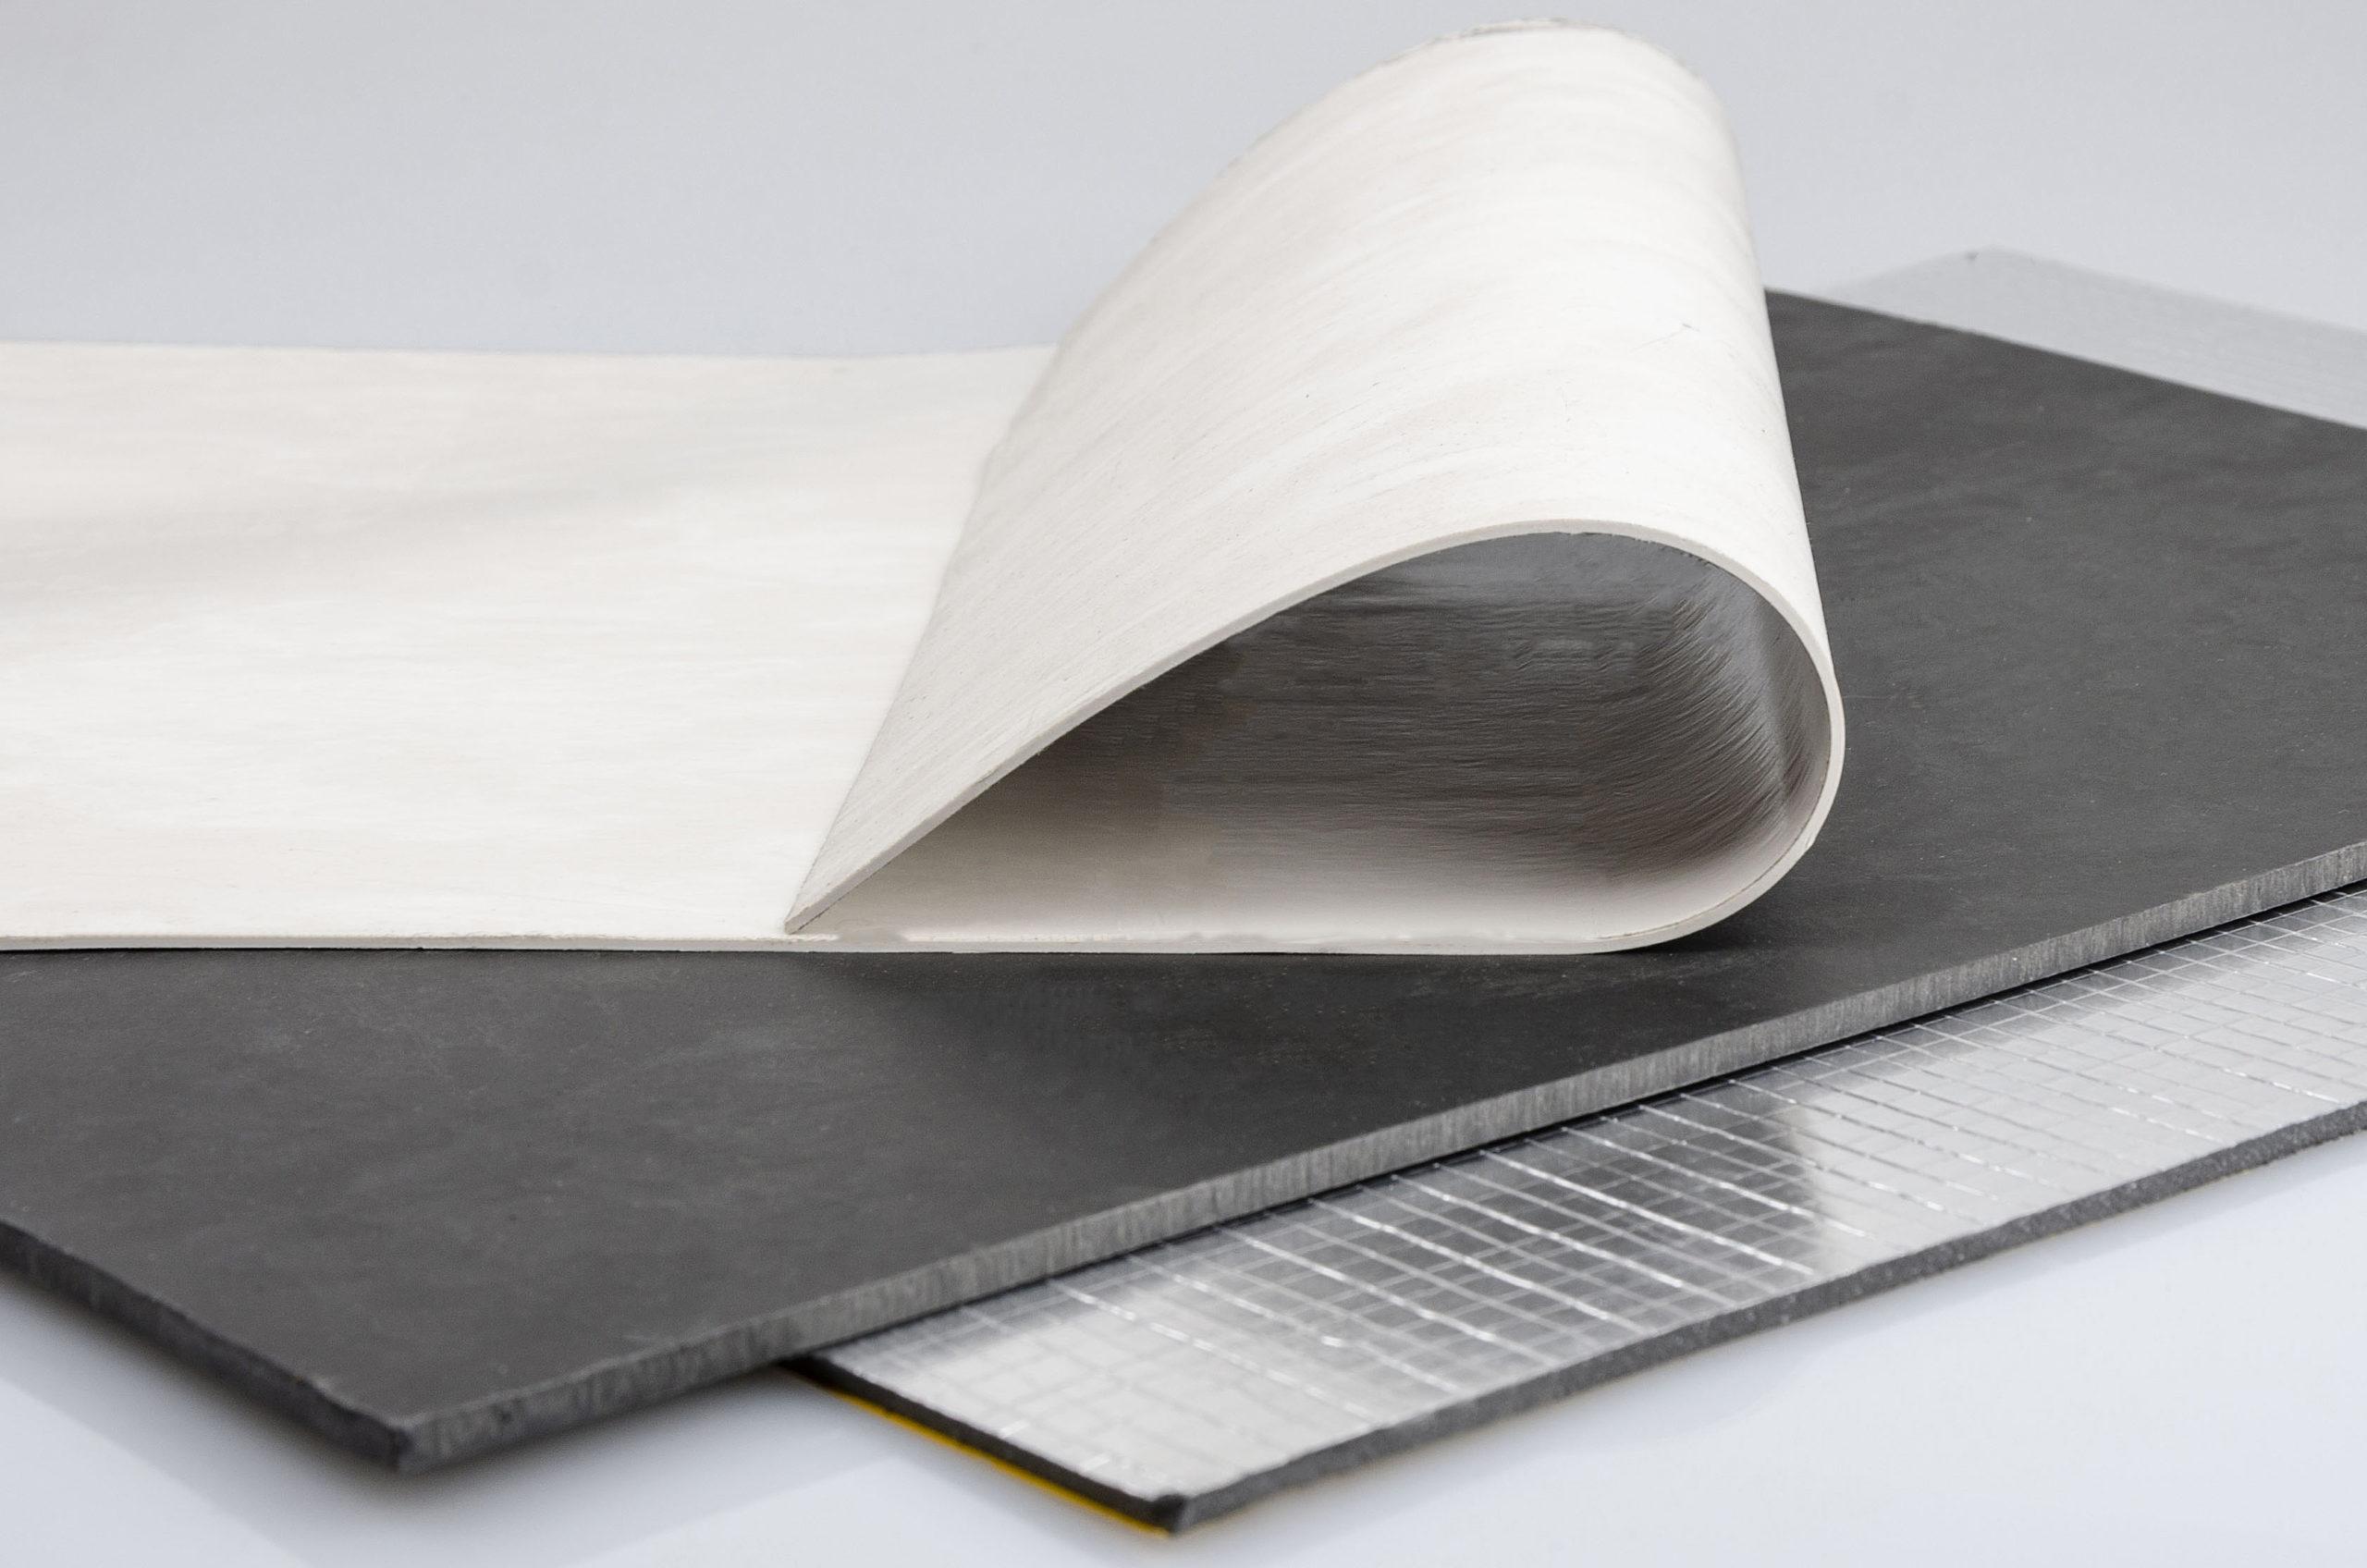 Armacell enhances acoustic portfolio with new ArmaComfort® acoustic barrier range